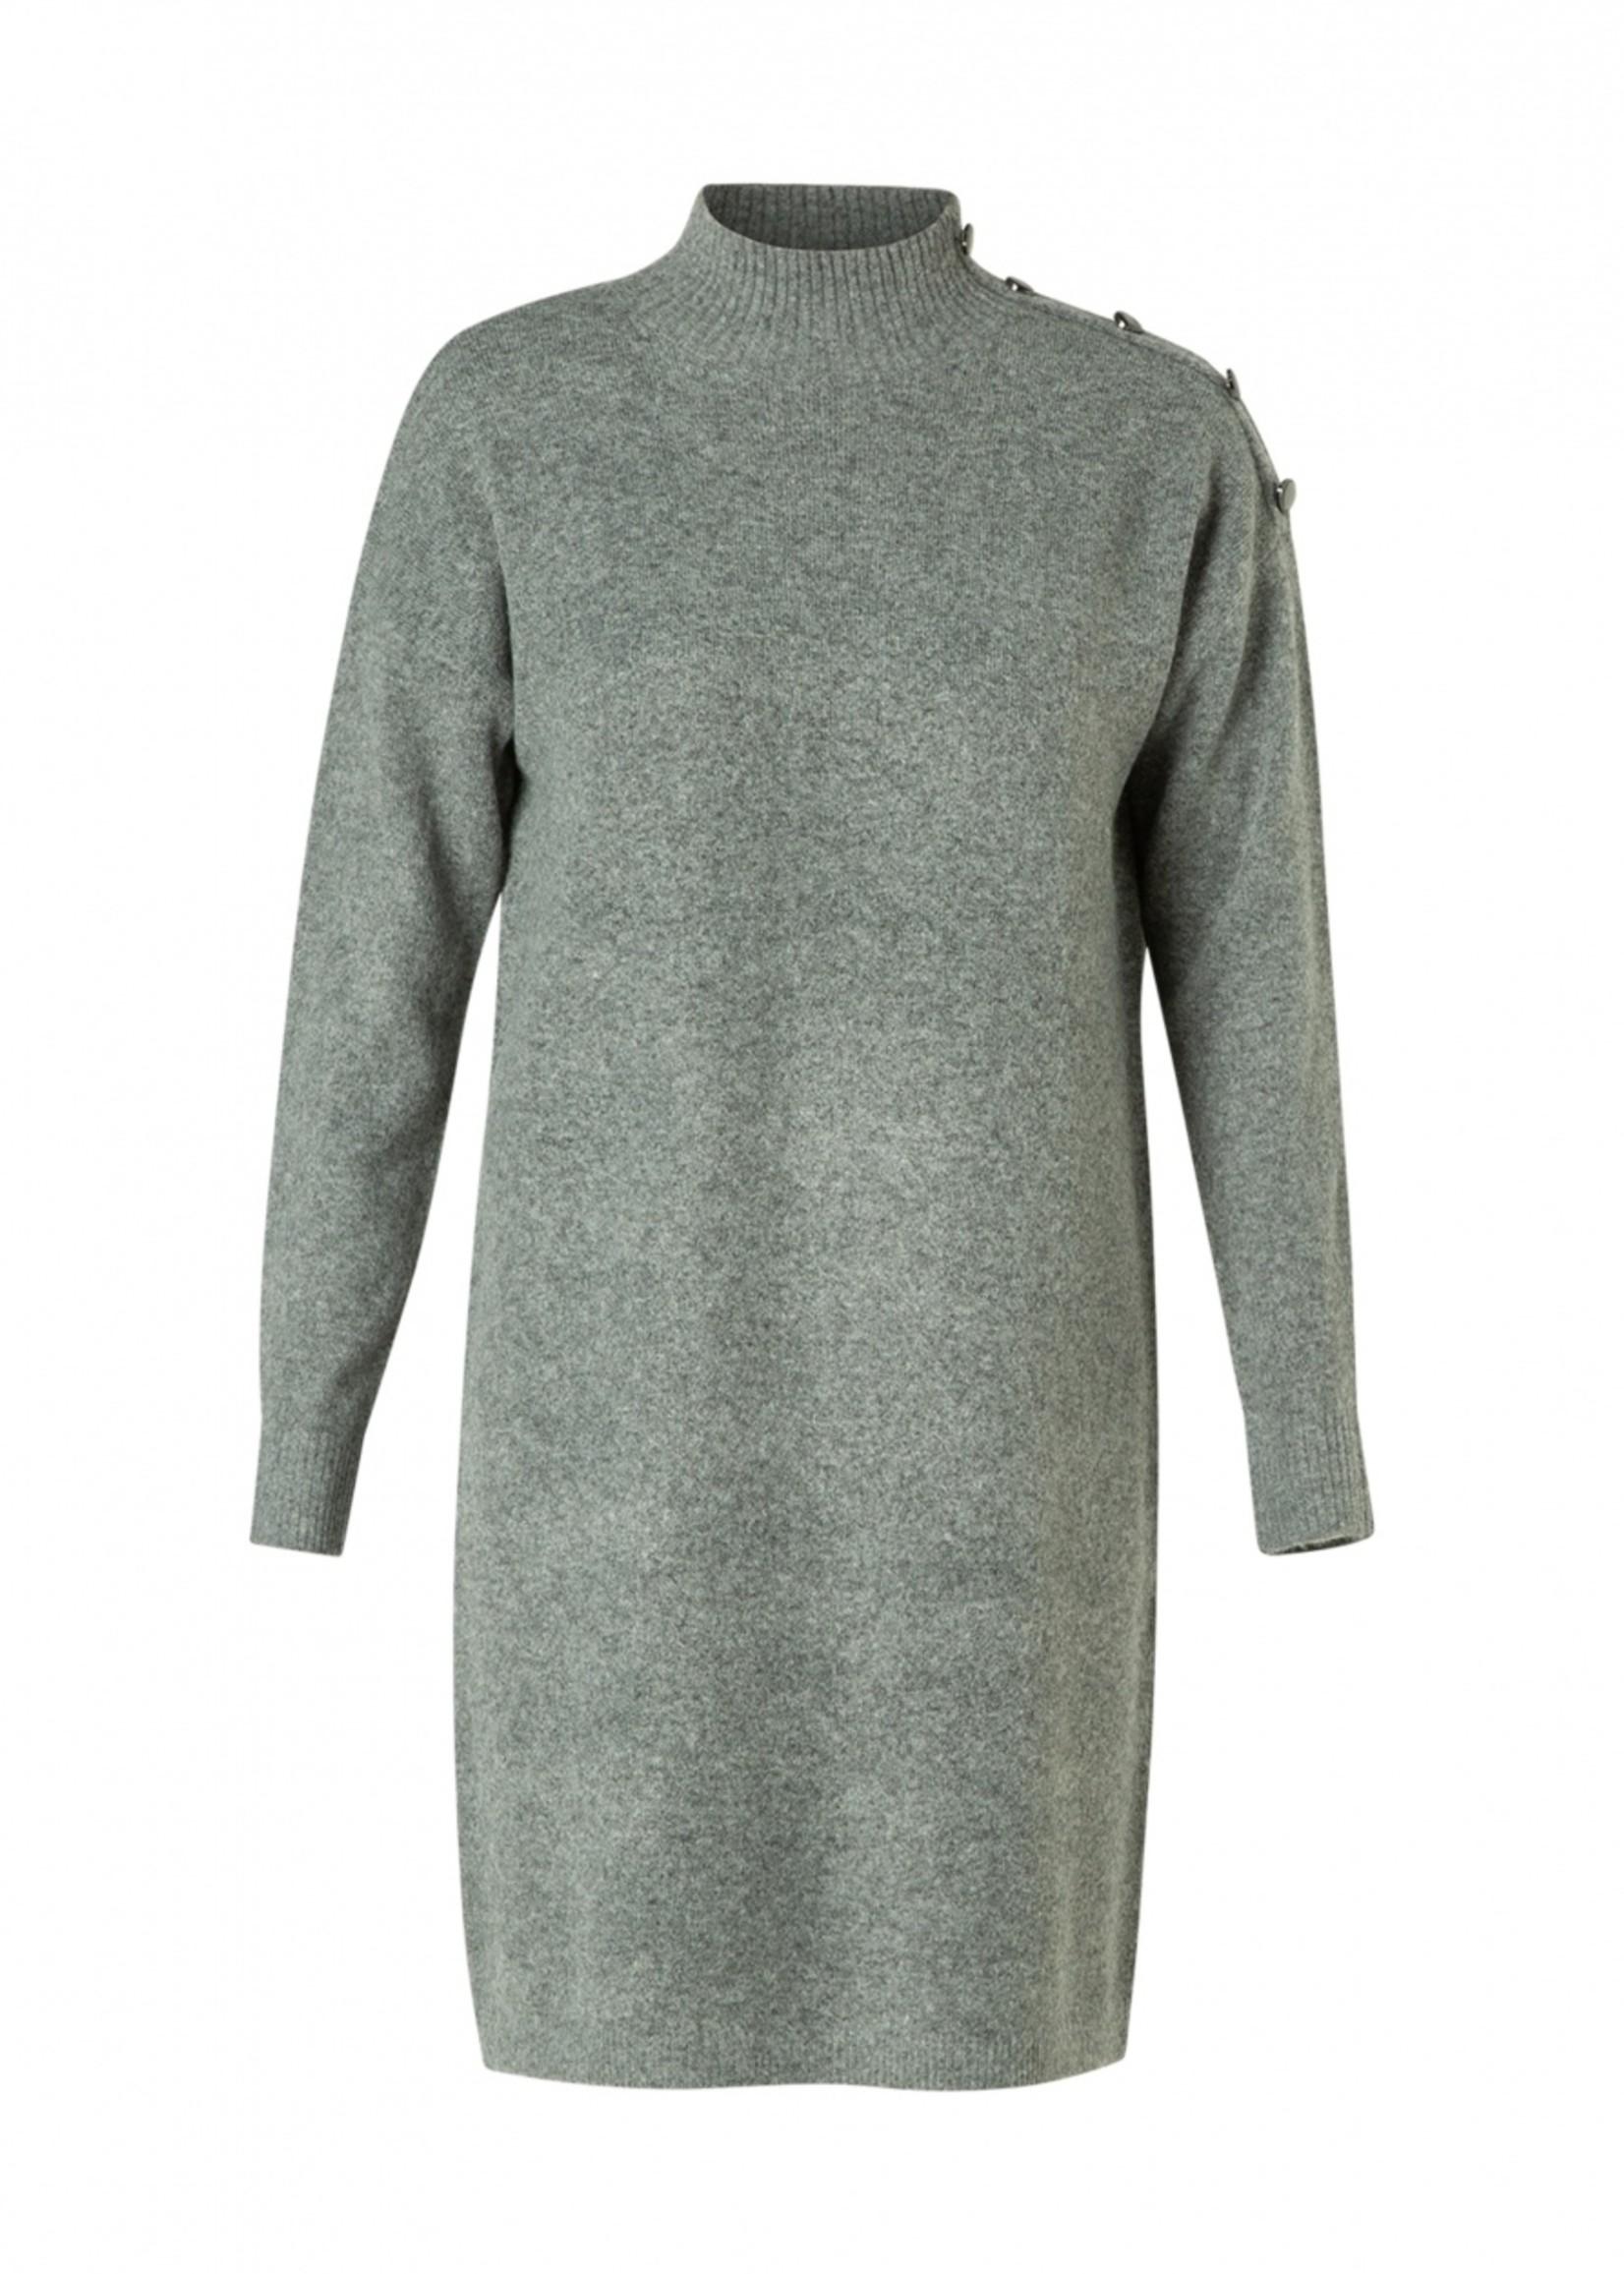 Yesta Yesta Berdine Knit Dress